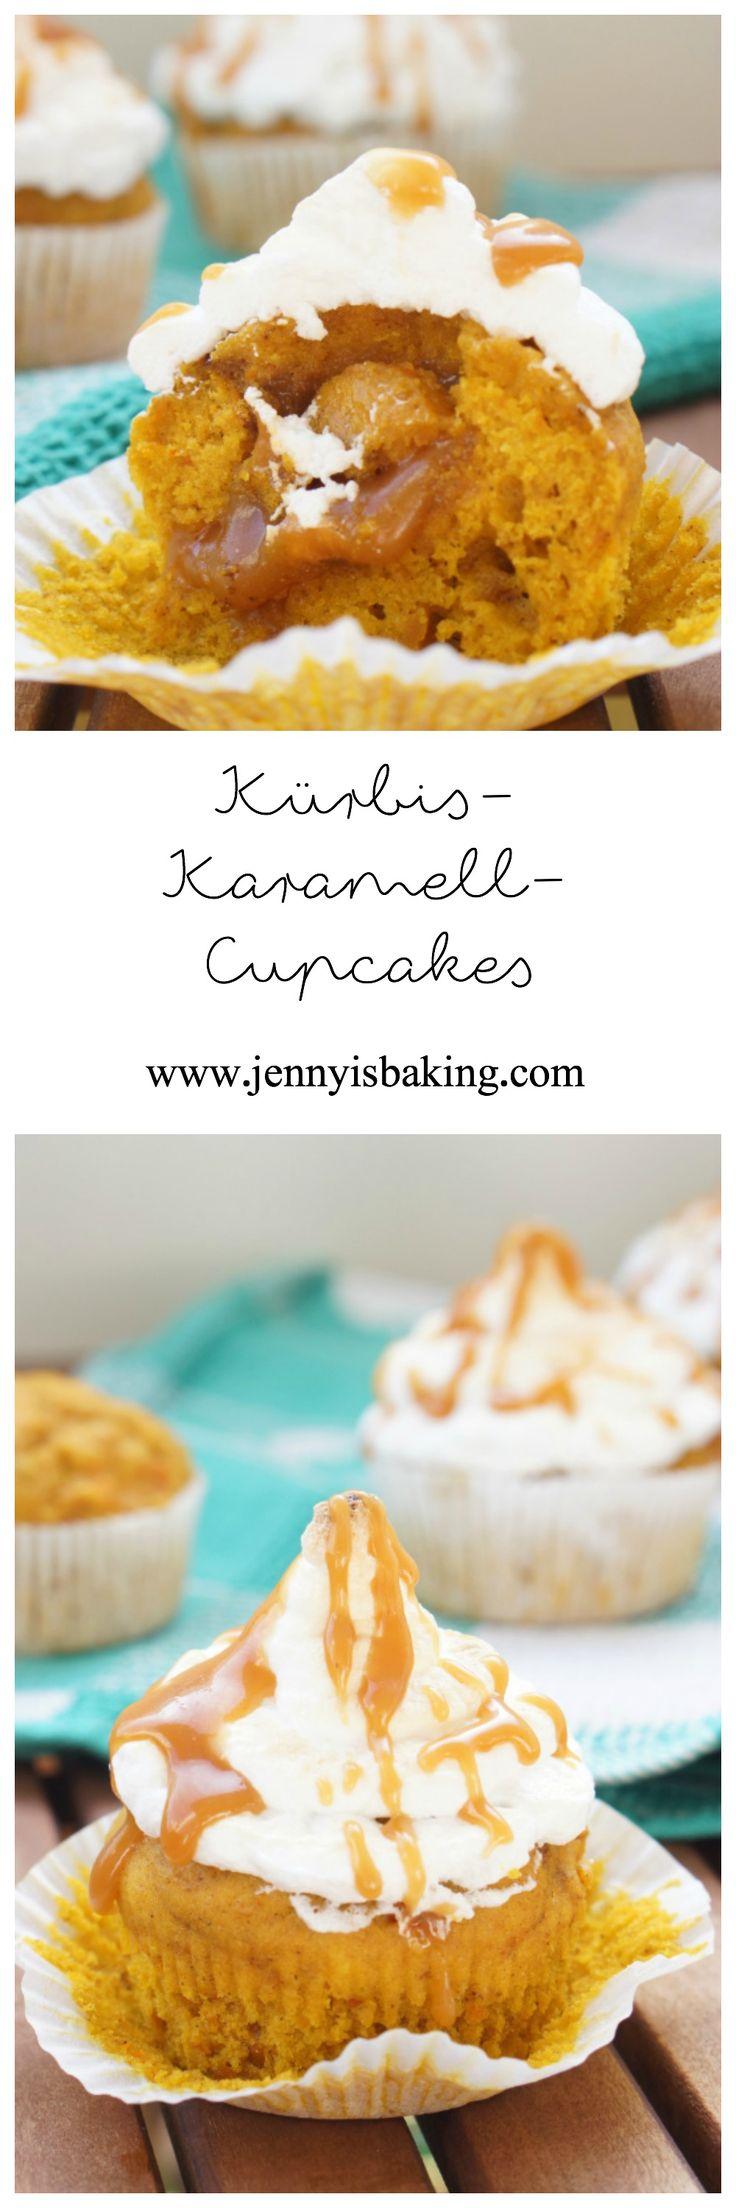 Kürbis-Karamell-Cupcakes mit Baiser